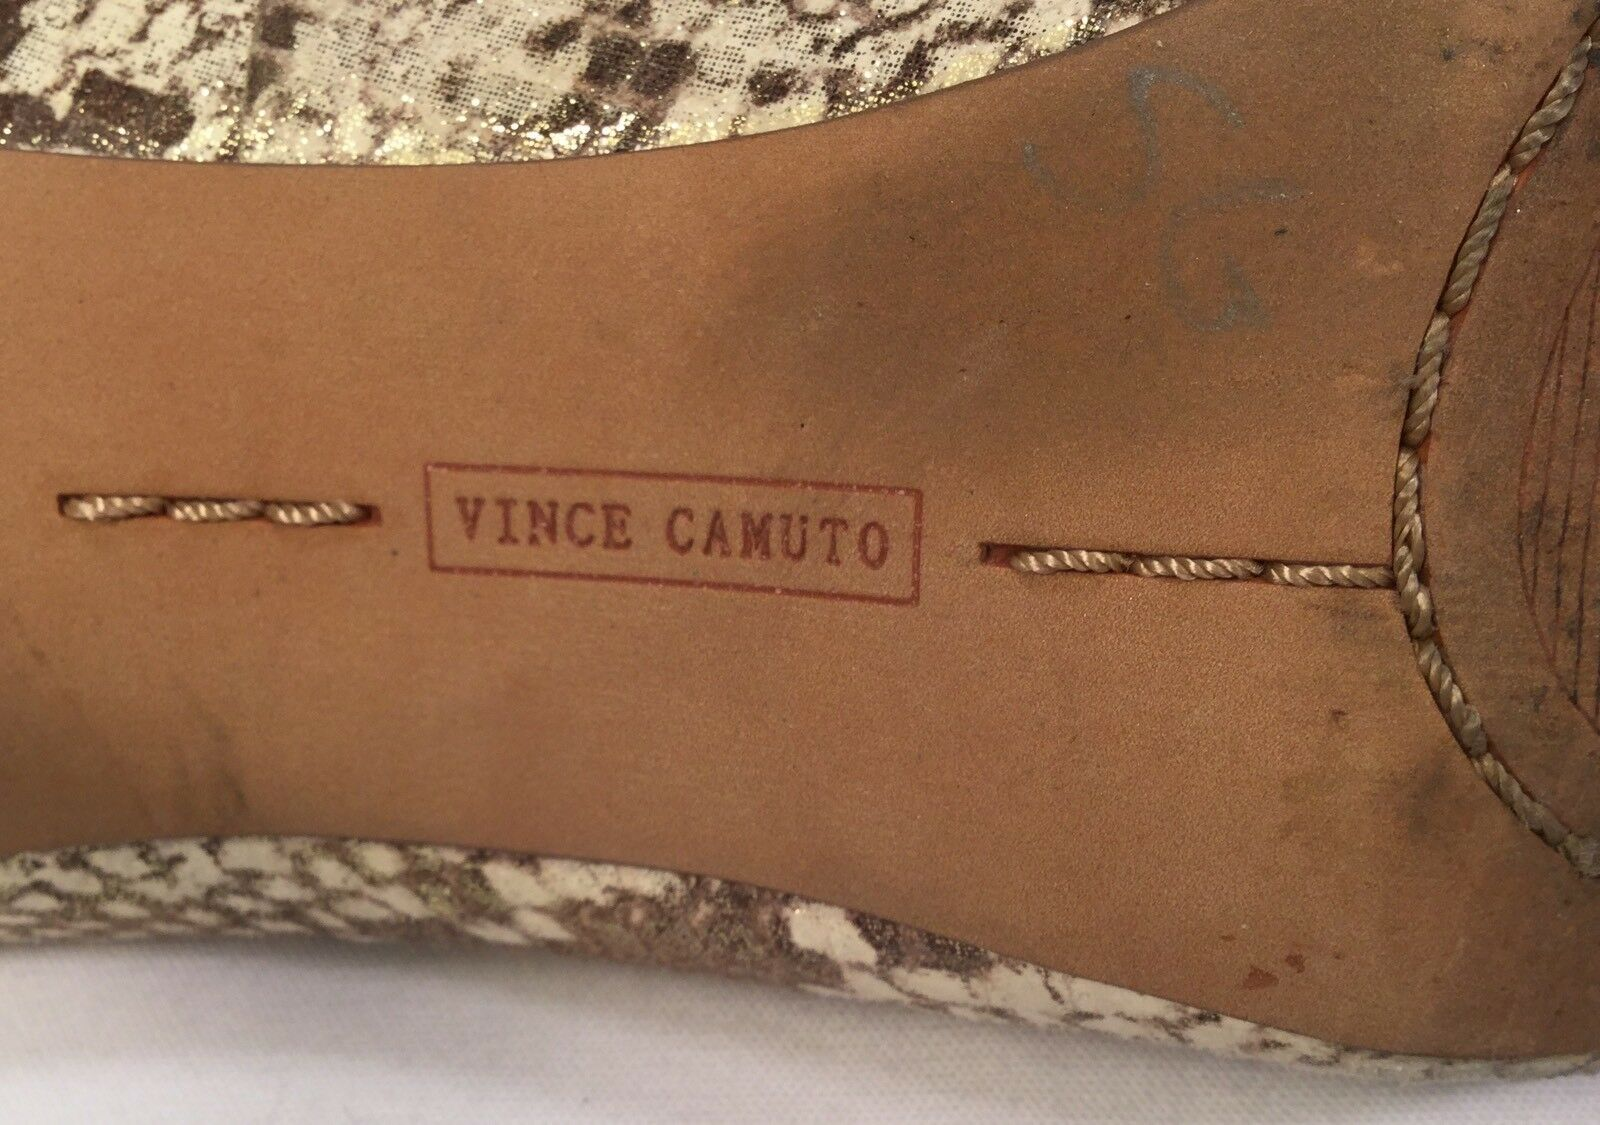 Vince Vince Vince Camuto Snakeskin schuhe Bone & braun Pumps Größe 8B Open Toe Nice Condition cbbc4e